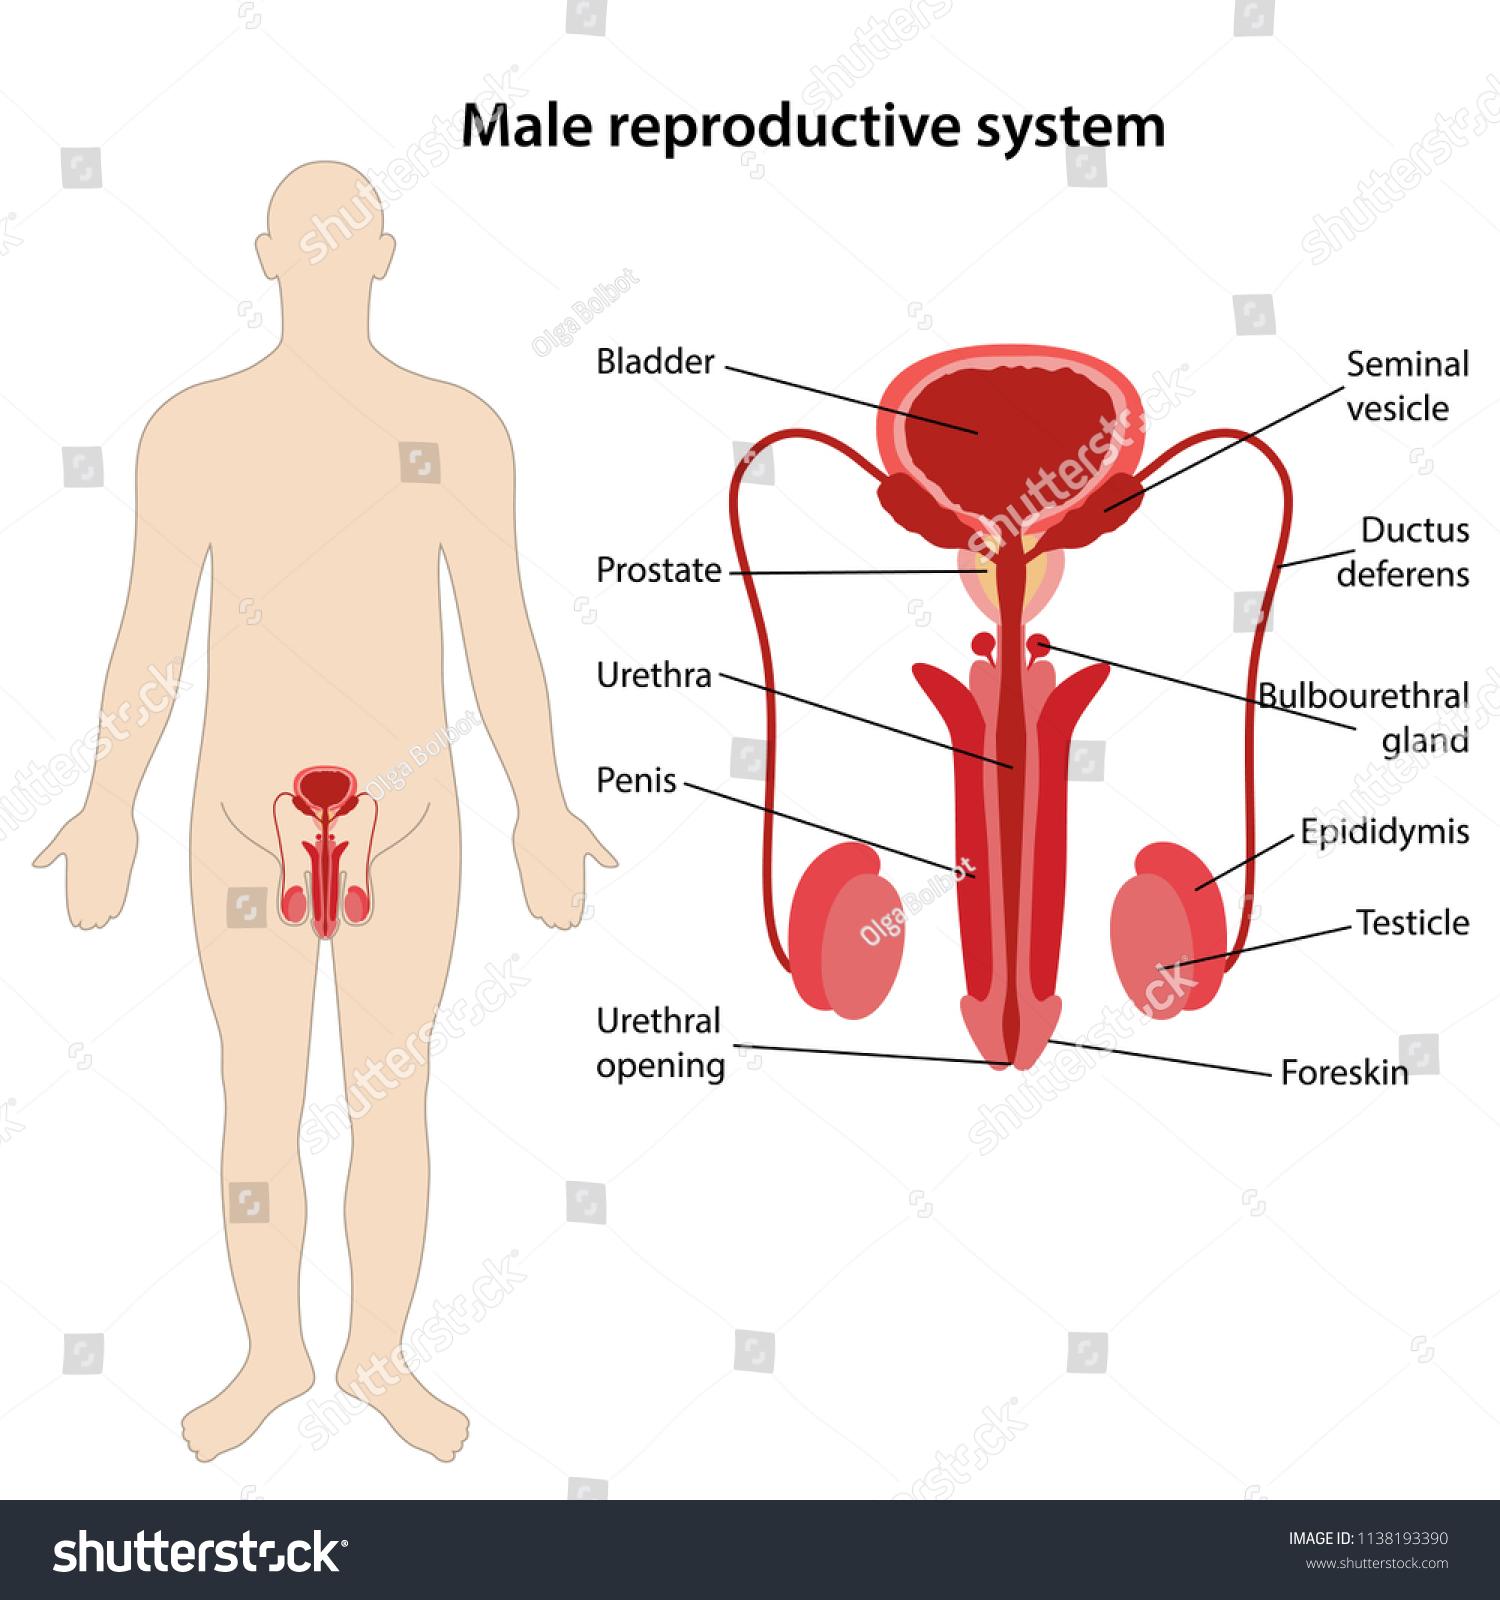 Male Reproductive System Main Parts Labeled Stock Vektorgrafik